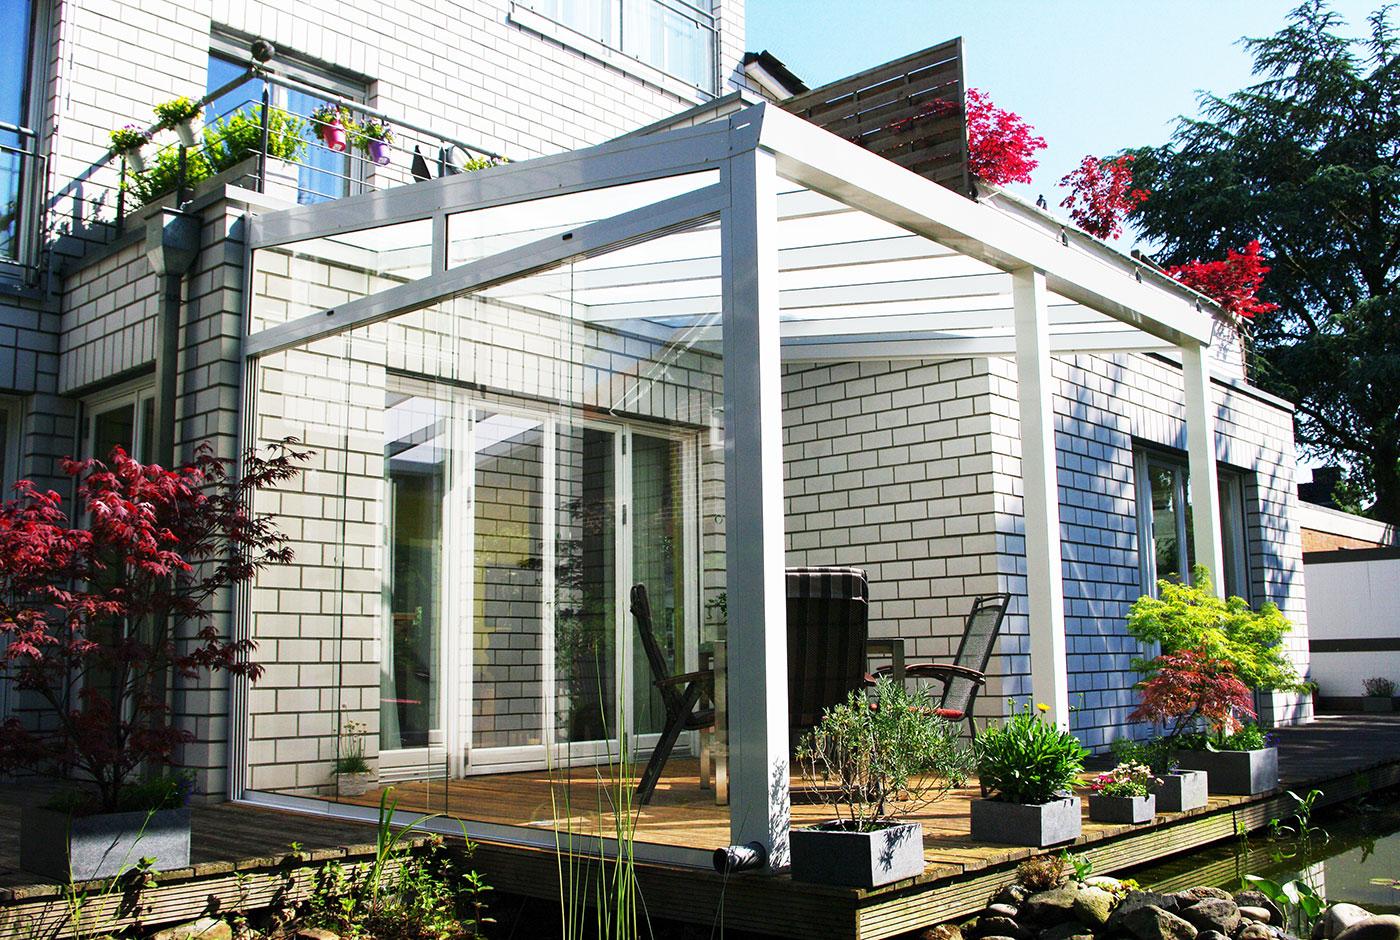 terrassenueberdachung-aluminium-wandanbau-weiß-gartenzimmer-teich - Kopie